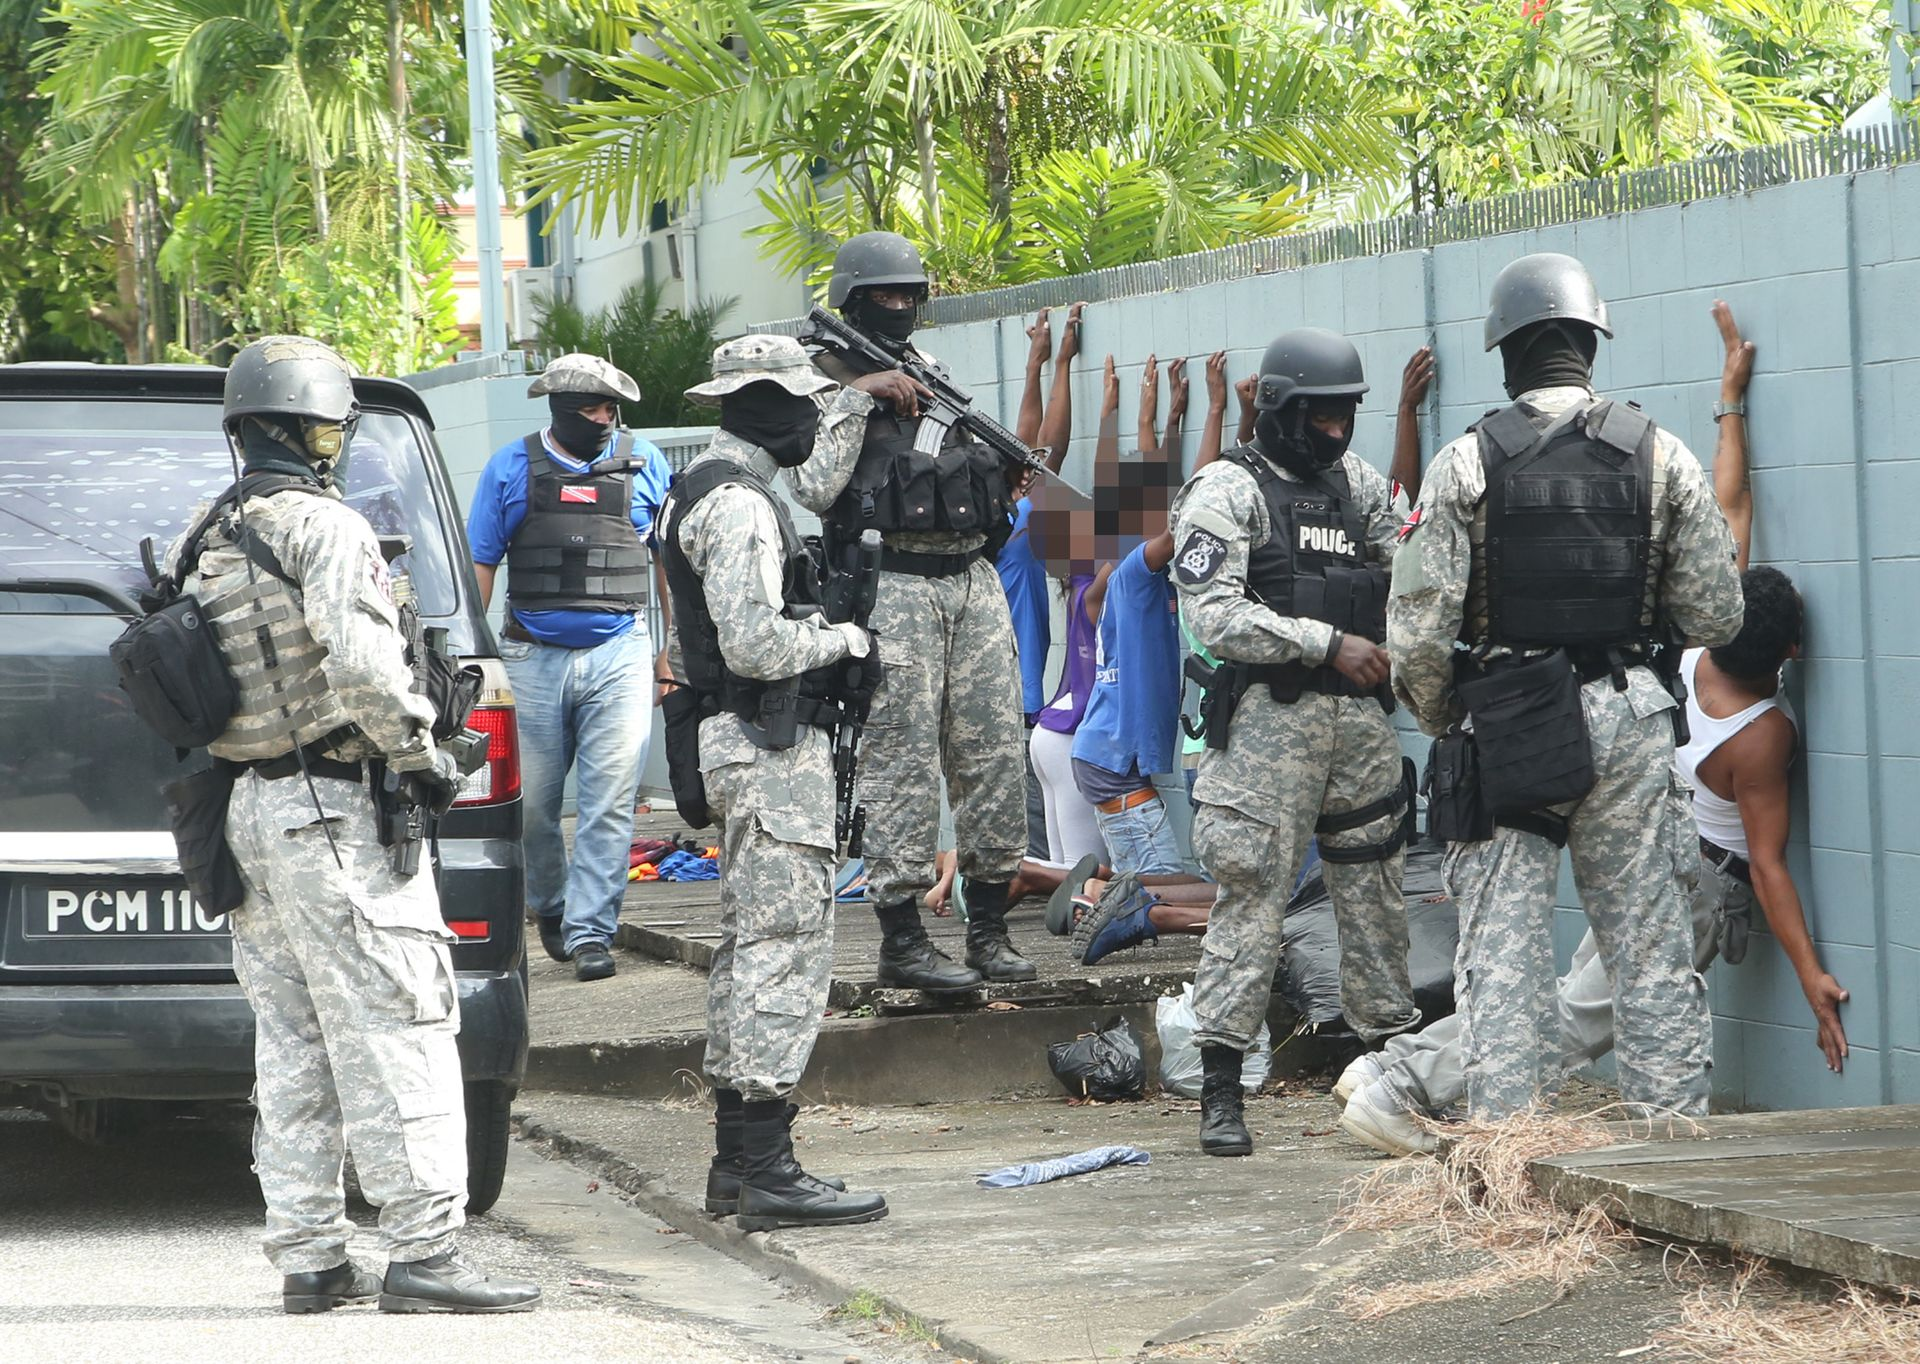 Trinidad: Police hunt more suspects after multi-million dollar drug